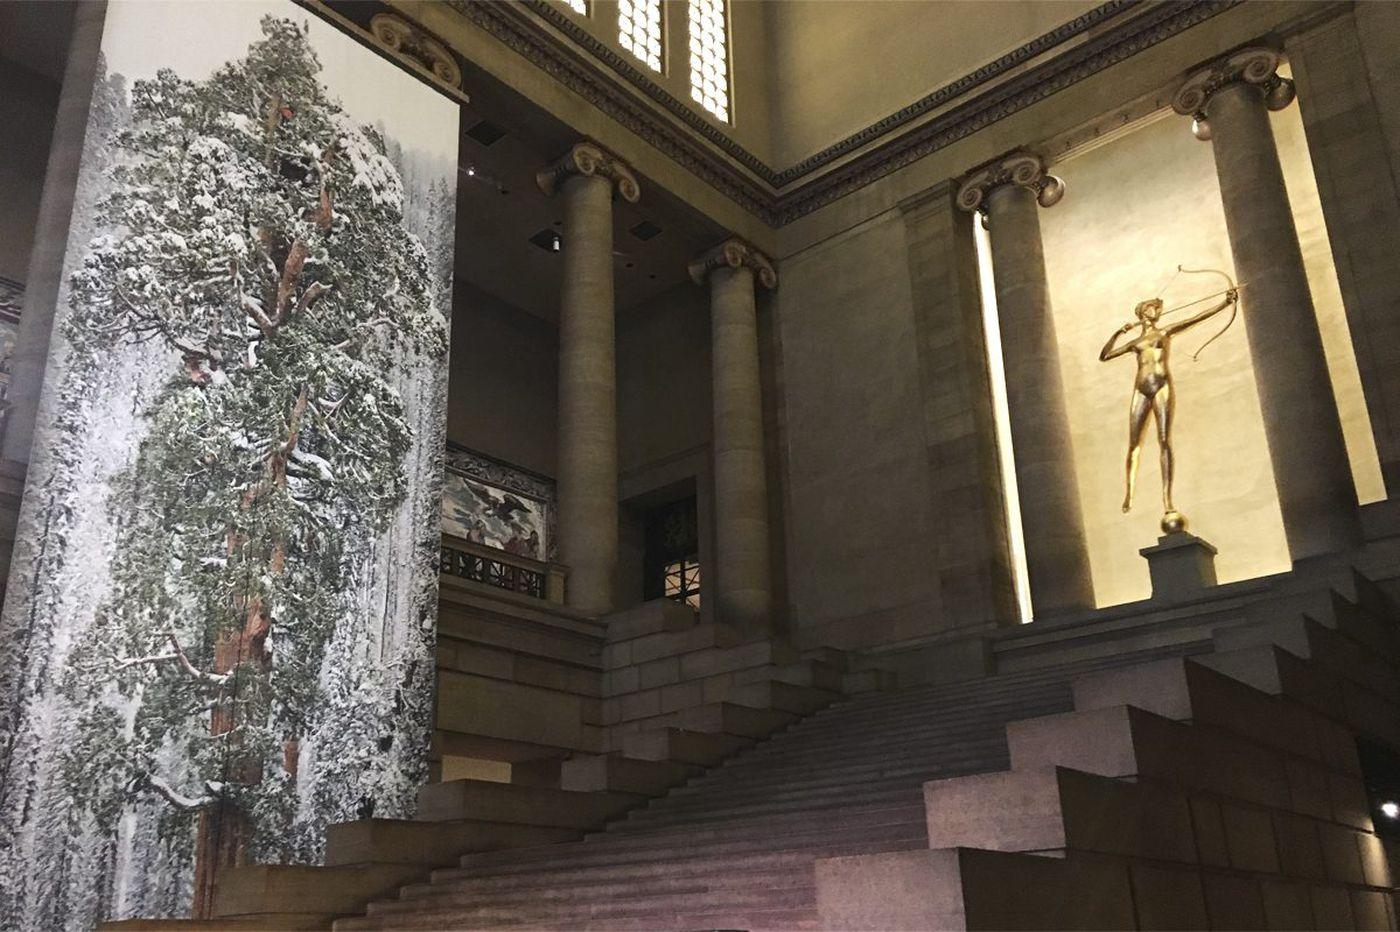 Philadelphia Museum of Art hangs massive tree banners to mark new wildlife photography exhibit